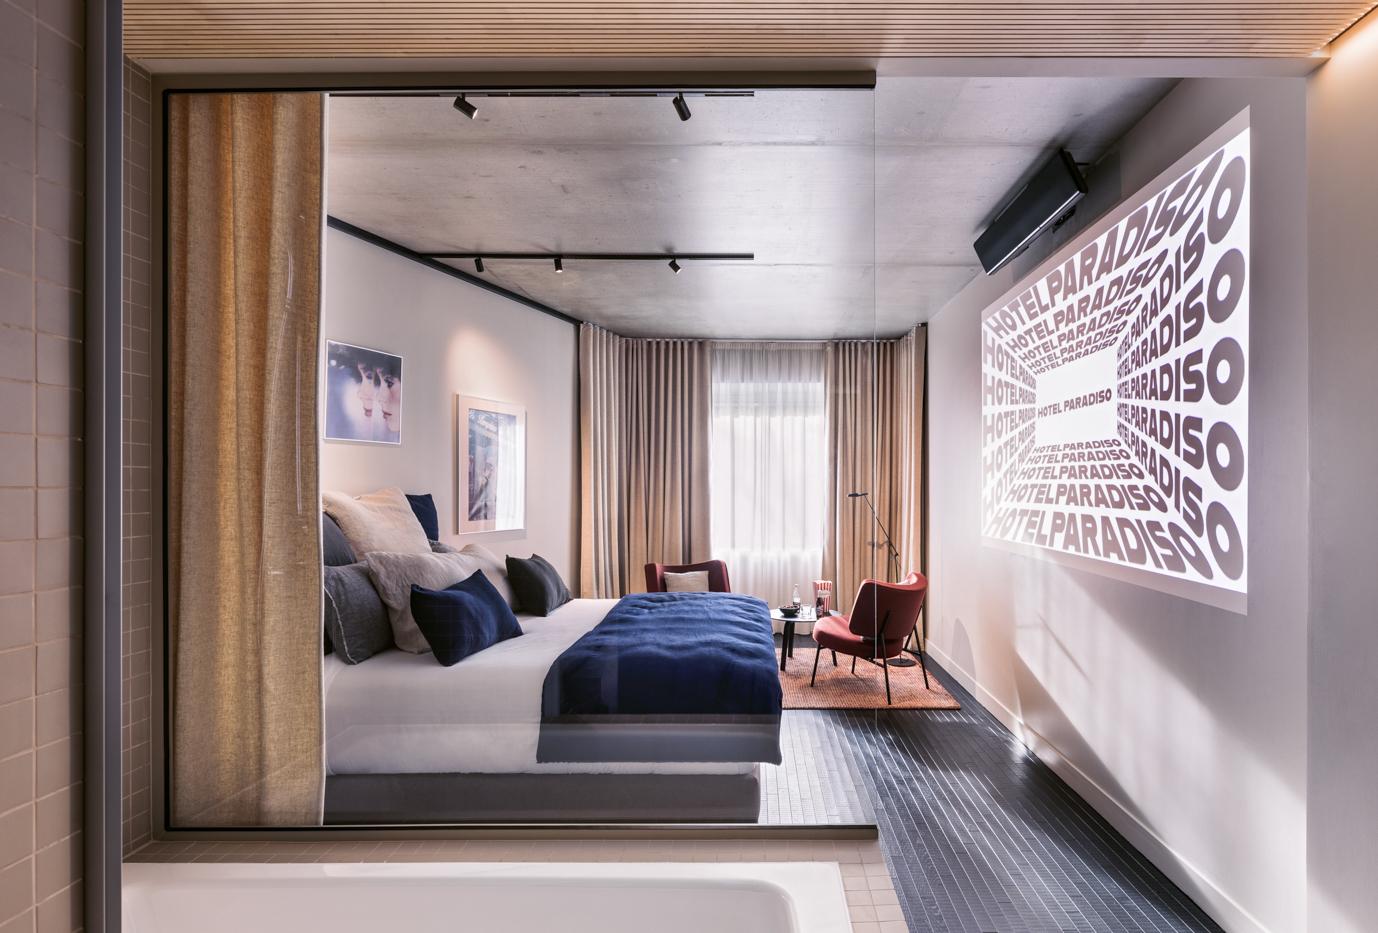 Hotel-Paradiso–RomainRicard-1-copie